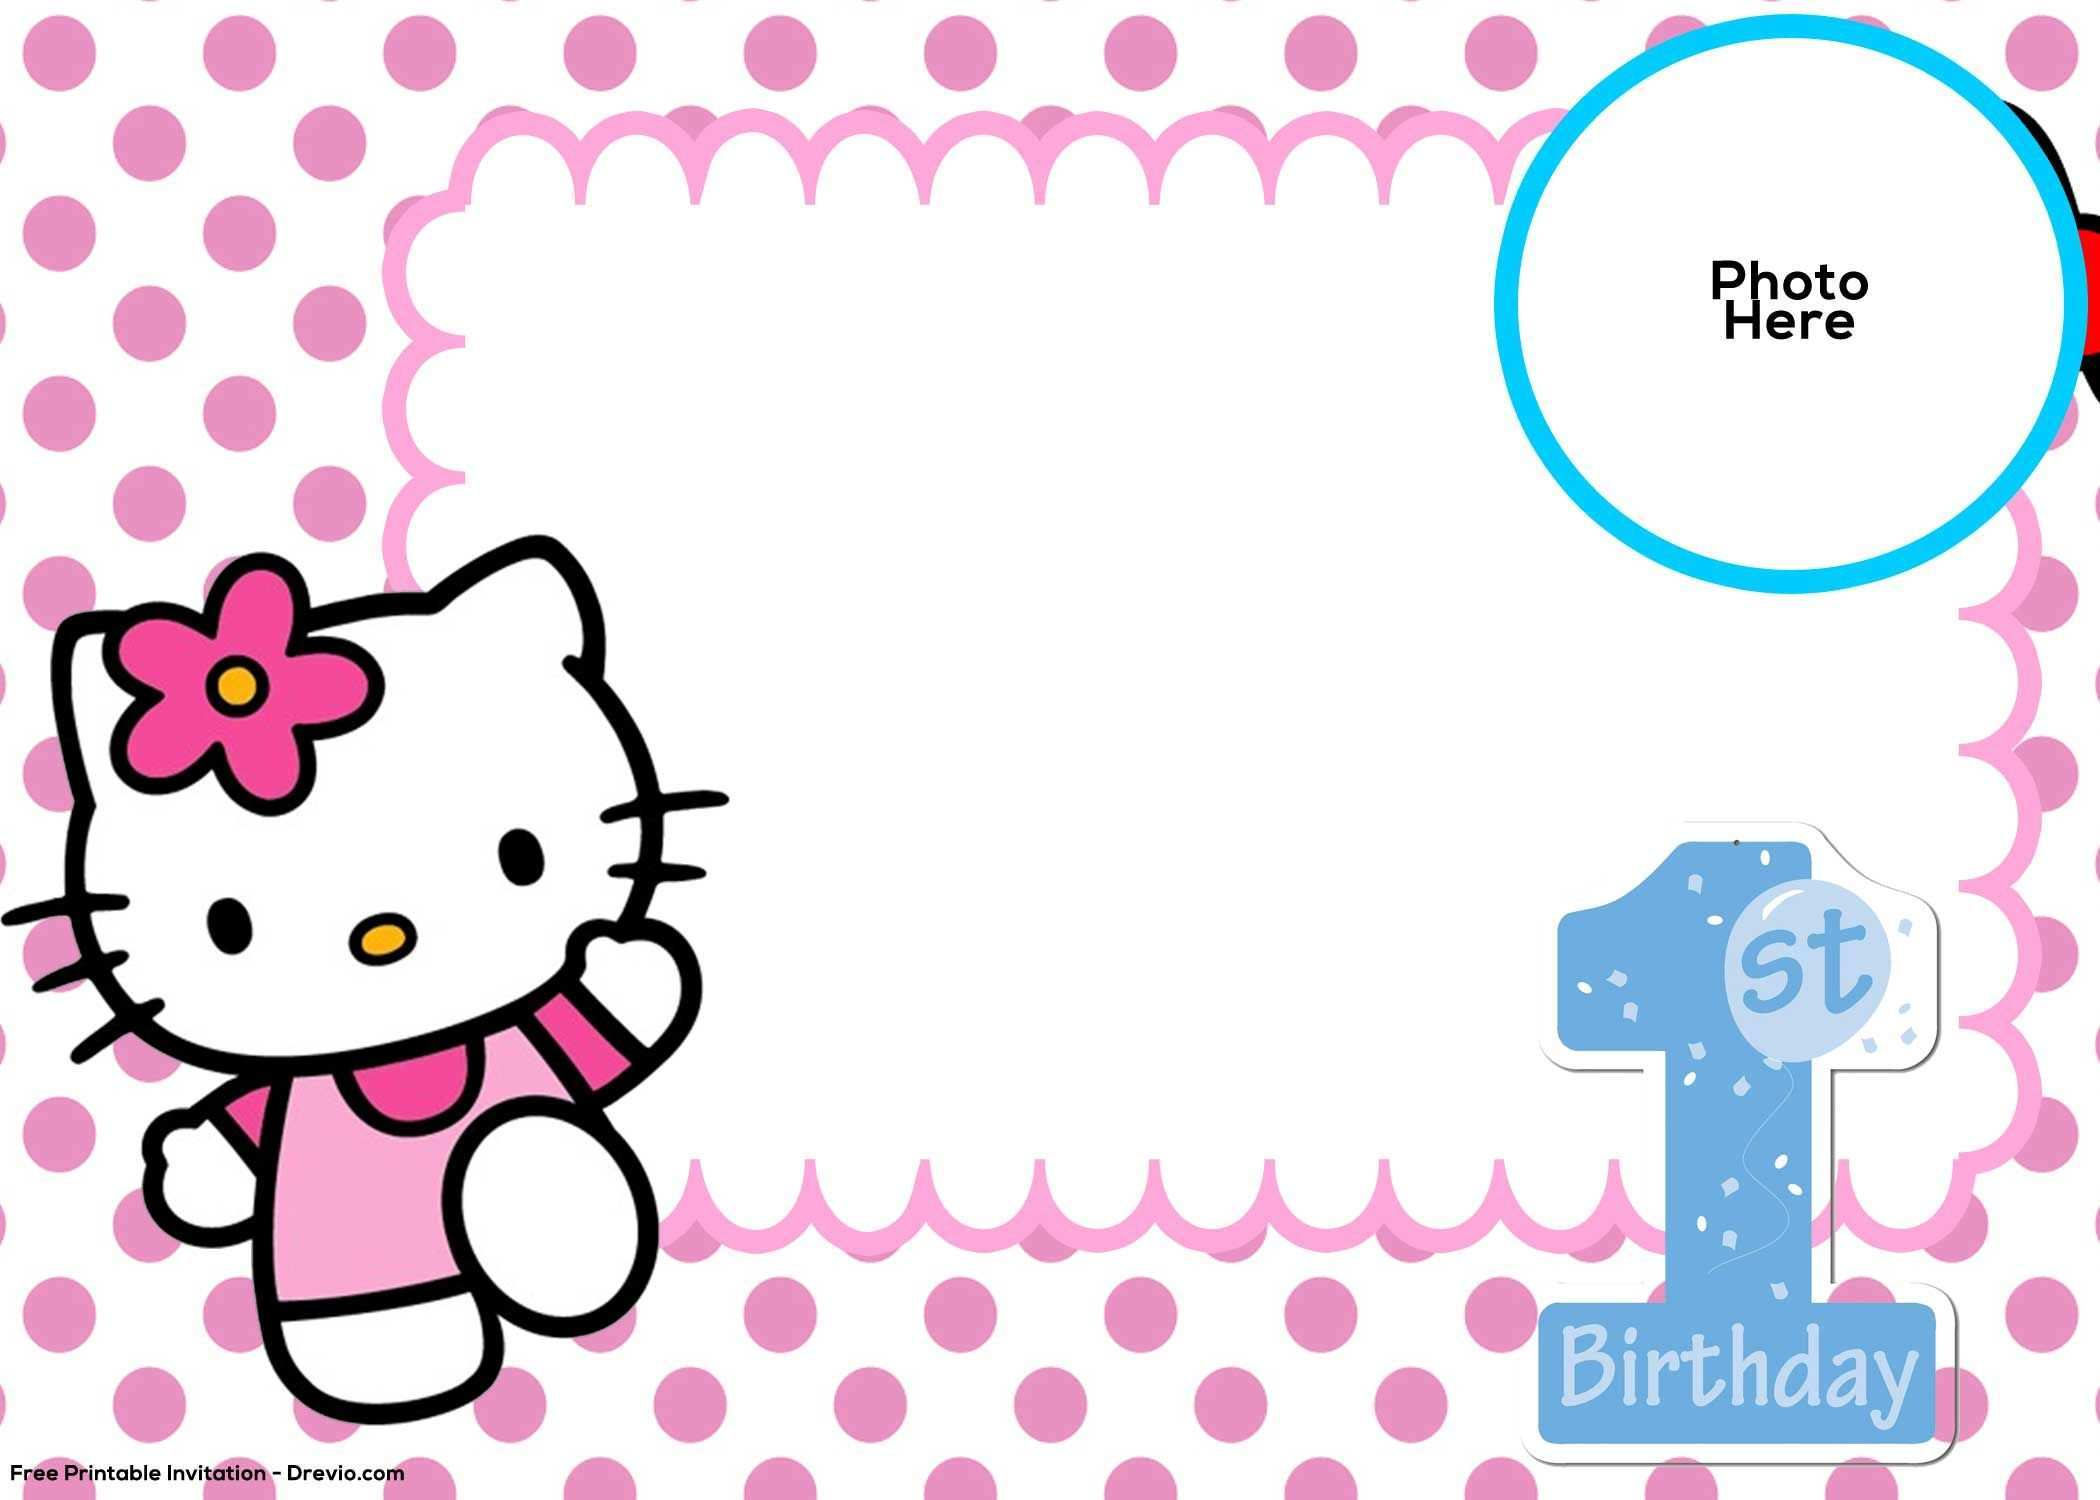 1st Birthday Card Template Word